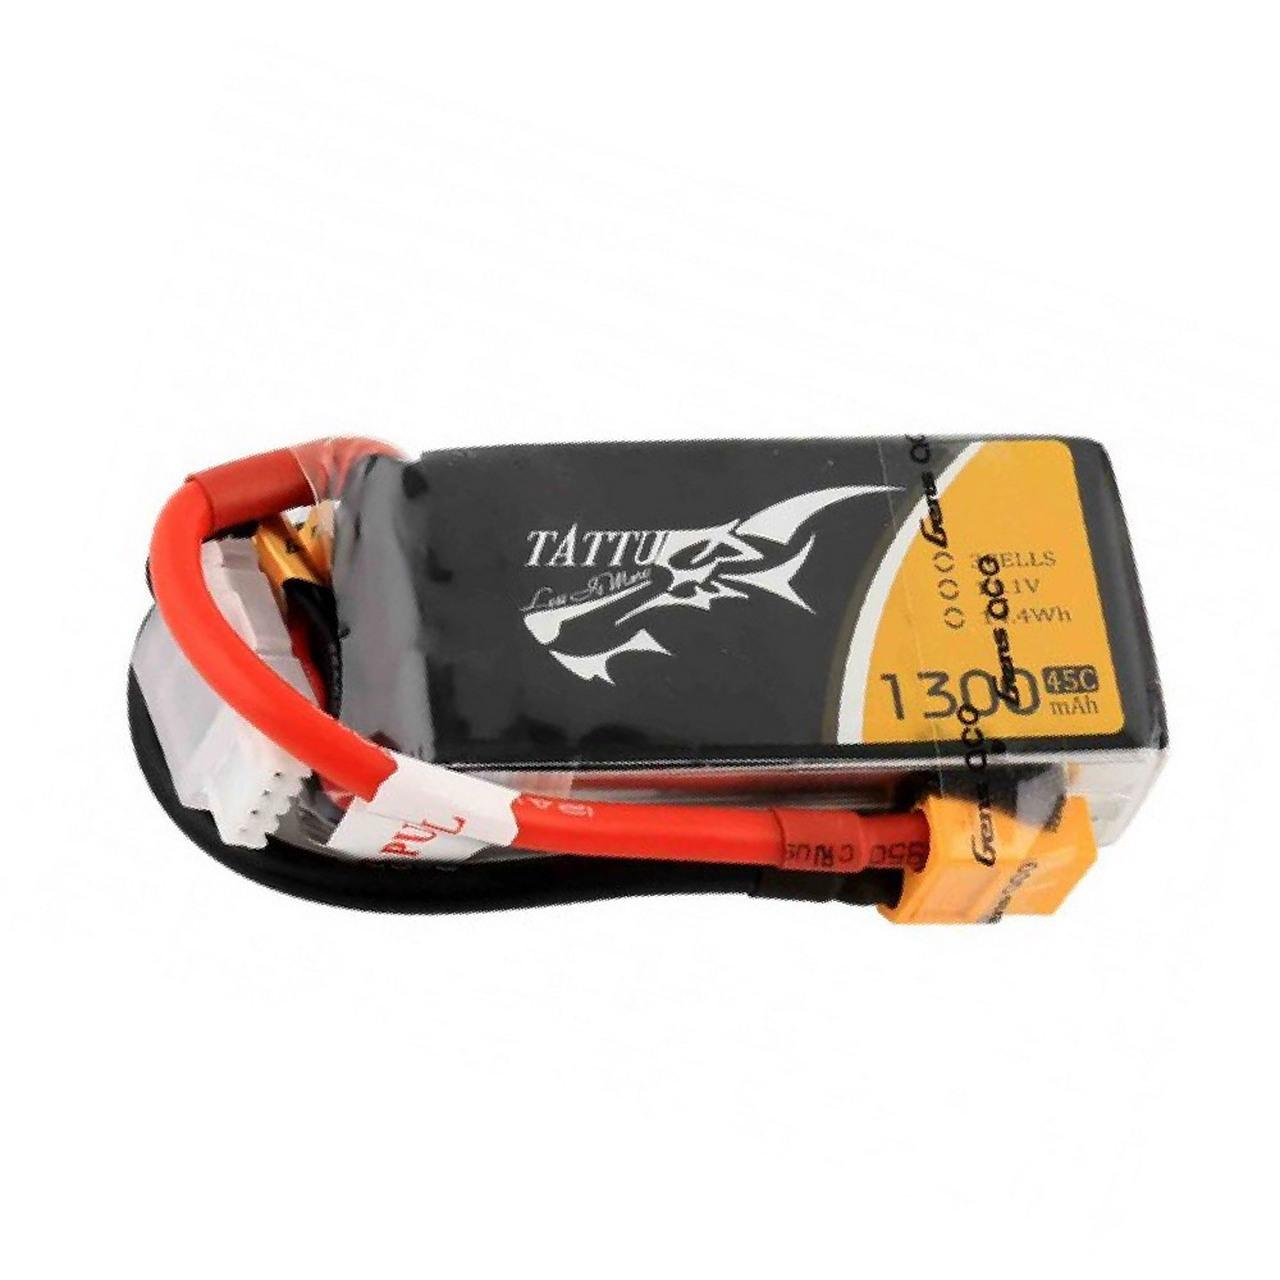 Tattu 1300mAh 45C 3S1P 11.1V Lipo Battery Pack with XT60 Plug